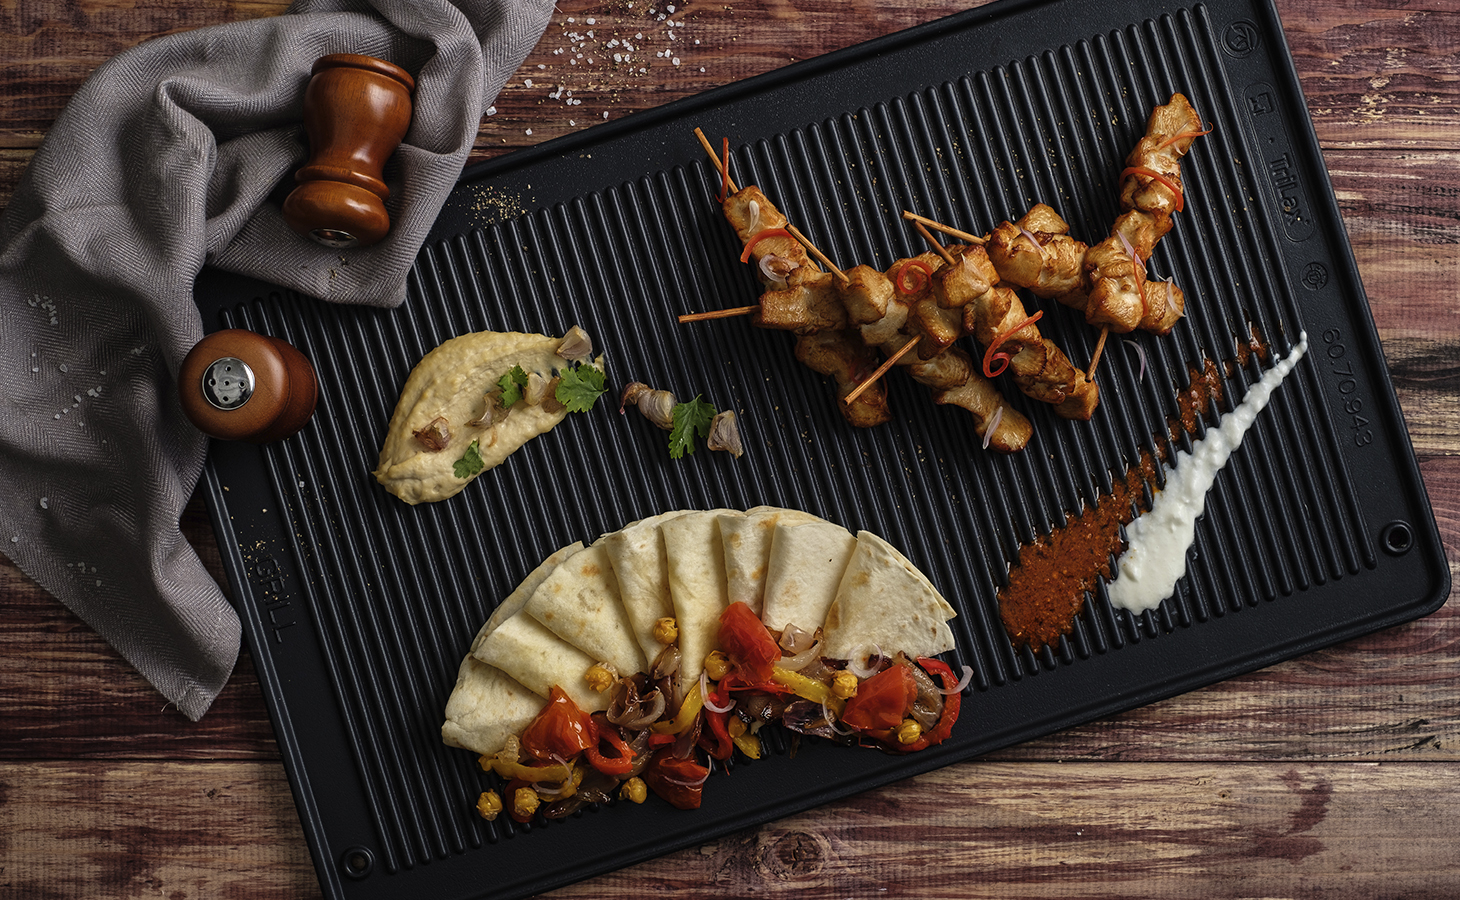 Chicken Breast Skewers 50g Country Cuisine